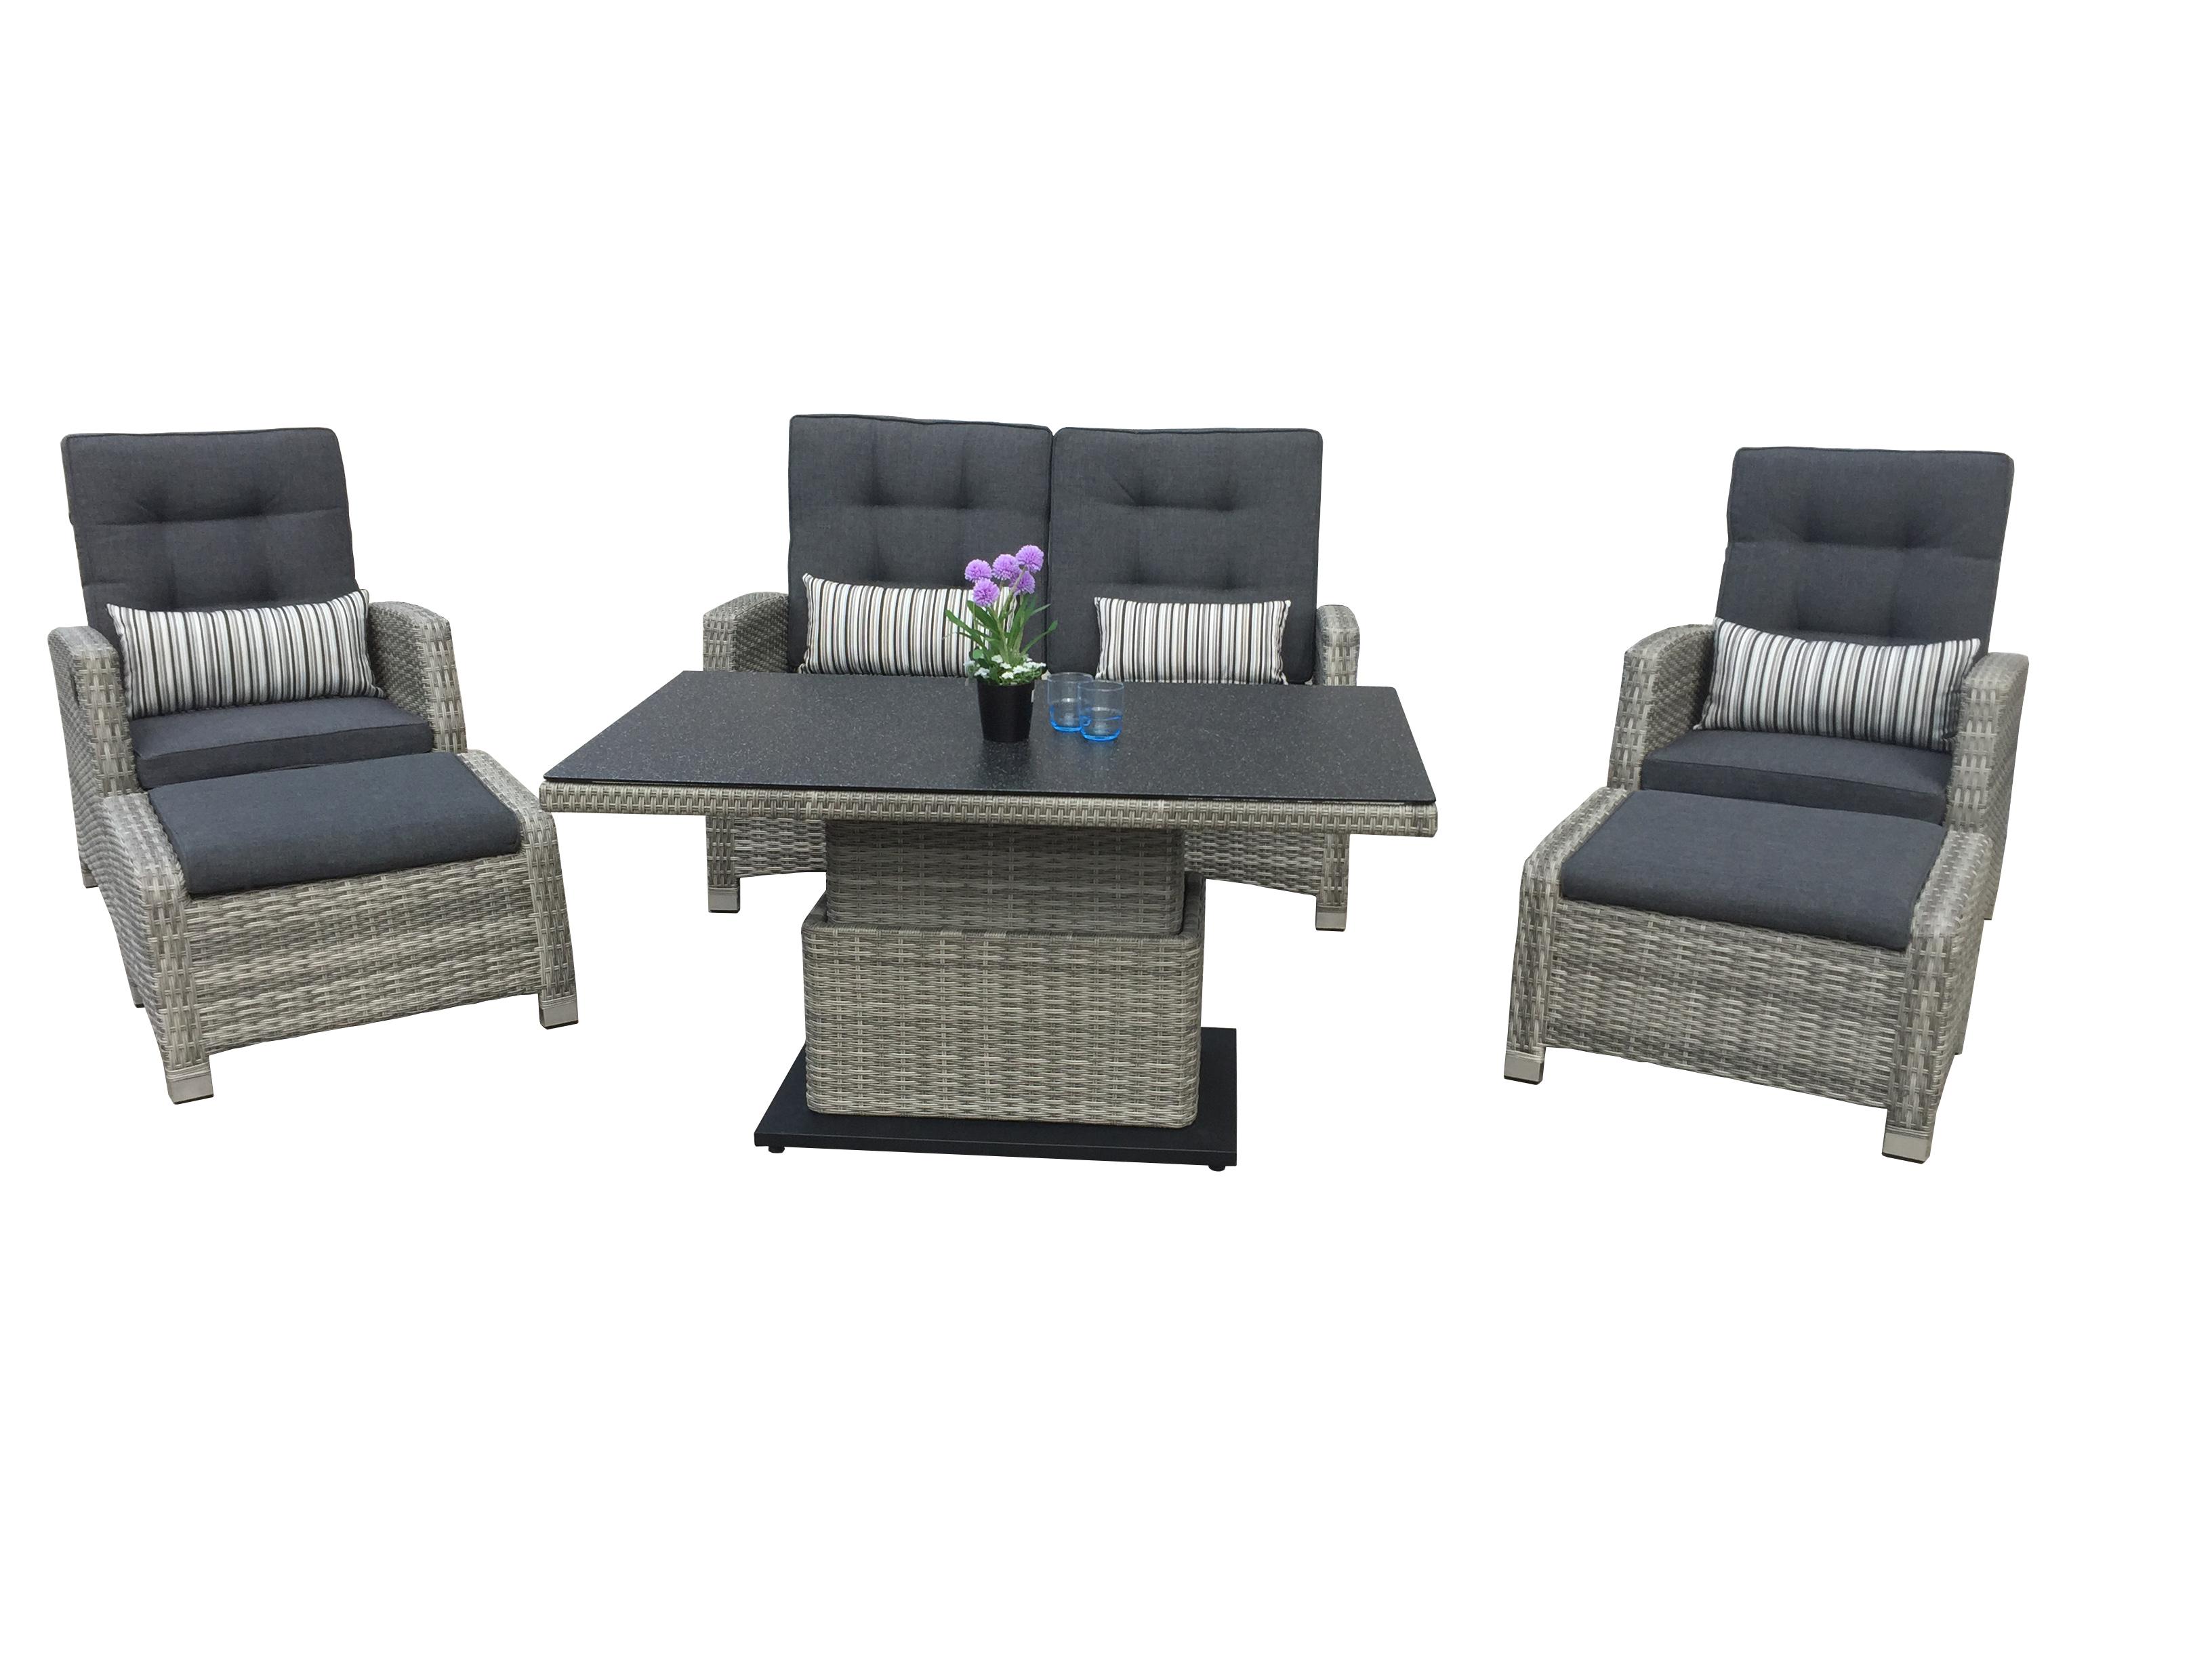 Häufig LARISSA Polyrattan Lounge Gartenmöbel Sitzgruppe - grau | Lounge QE15